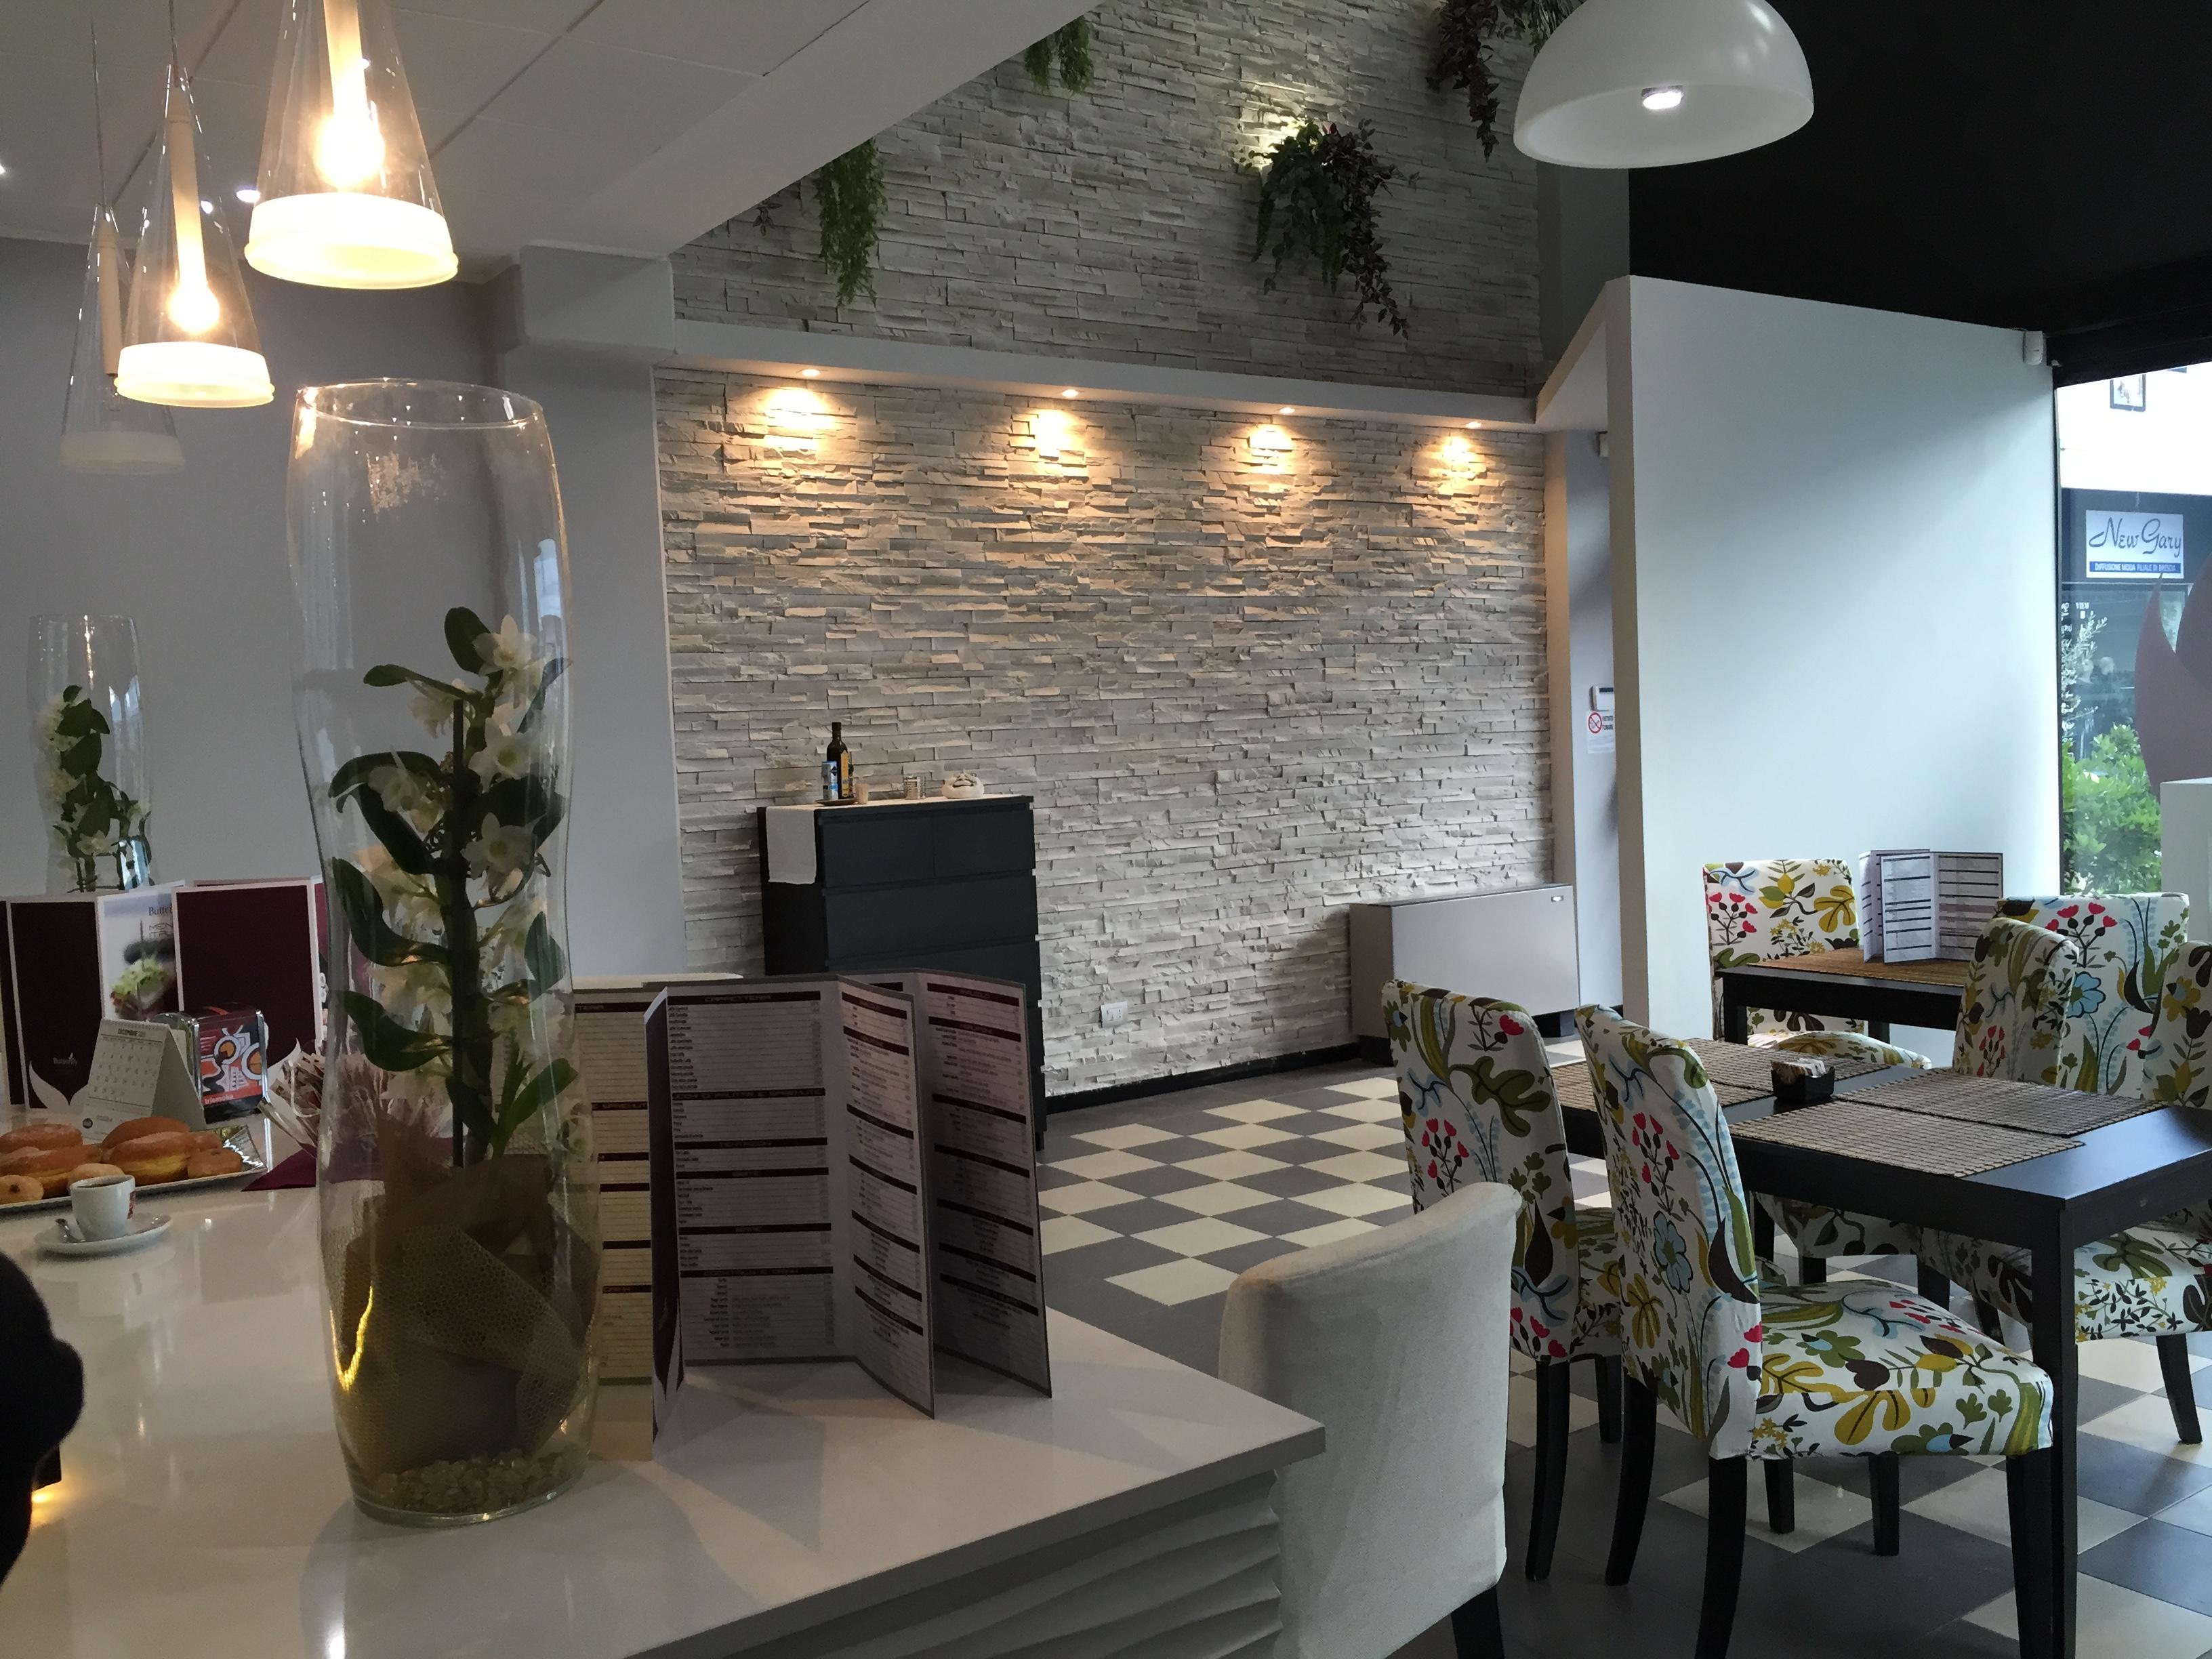 Butterfly living lounge cafe brescia for Piastrelle finta pietra